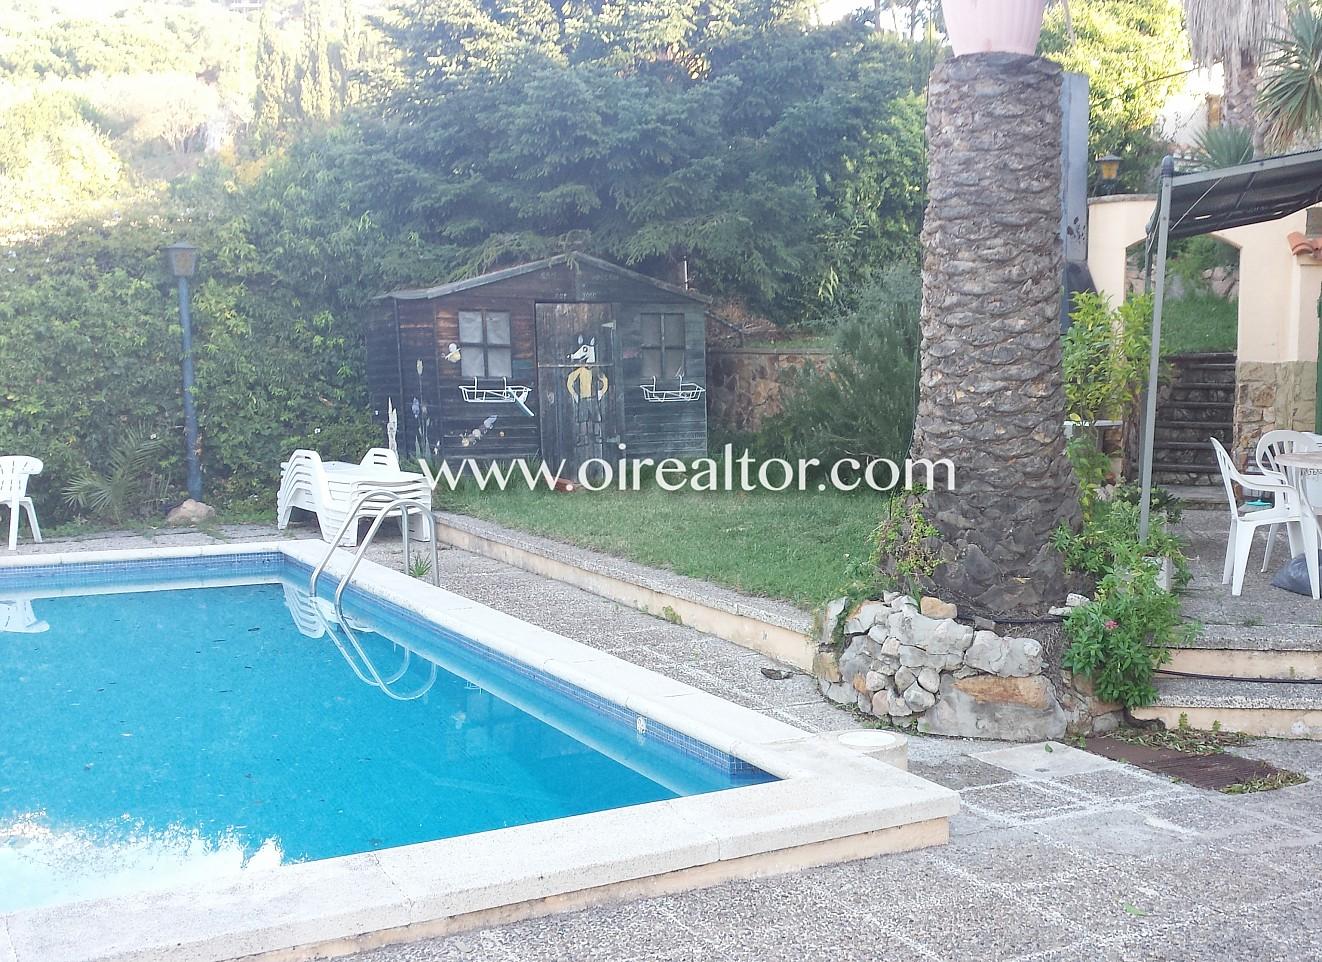 Espaciosa casa a pocos minutos de lloret de mar con for Hoteles en lloret de mar con piscina climatizada